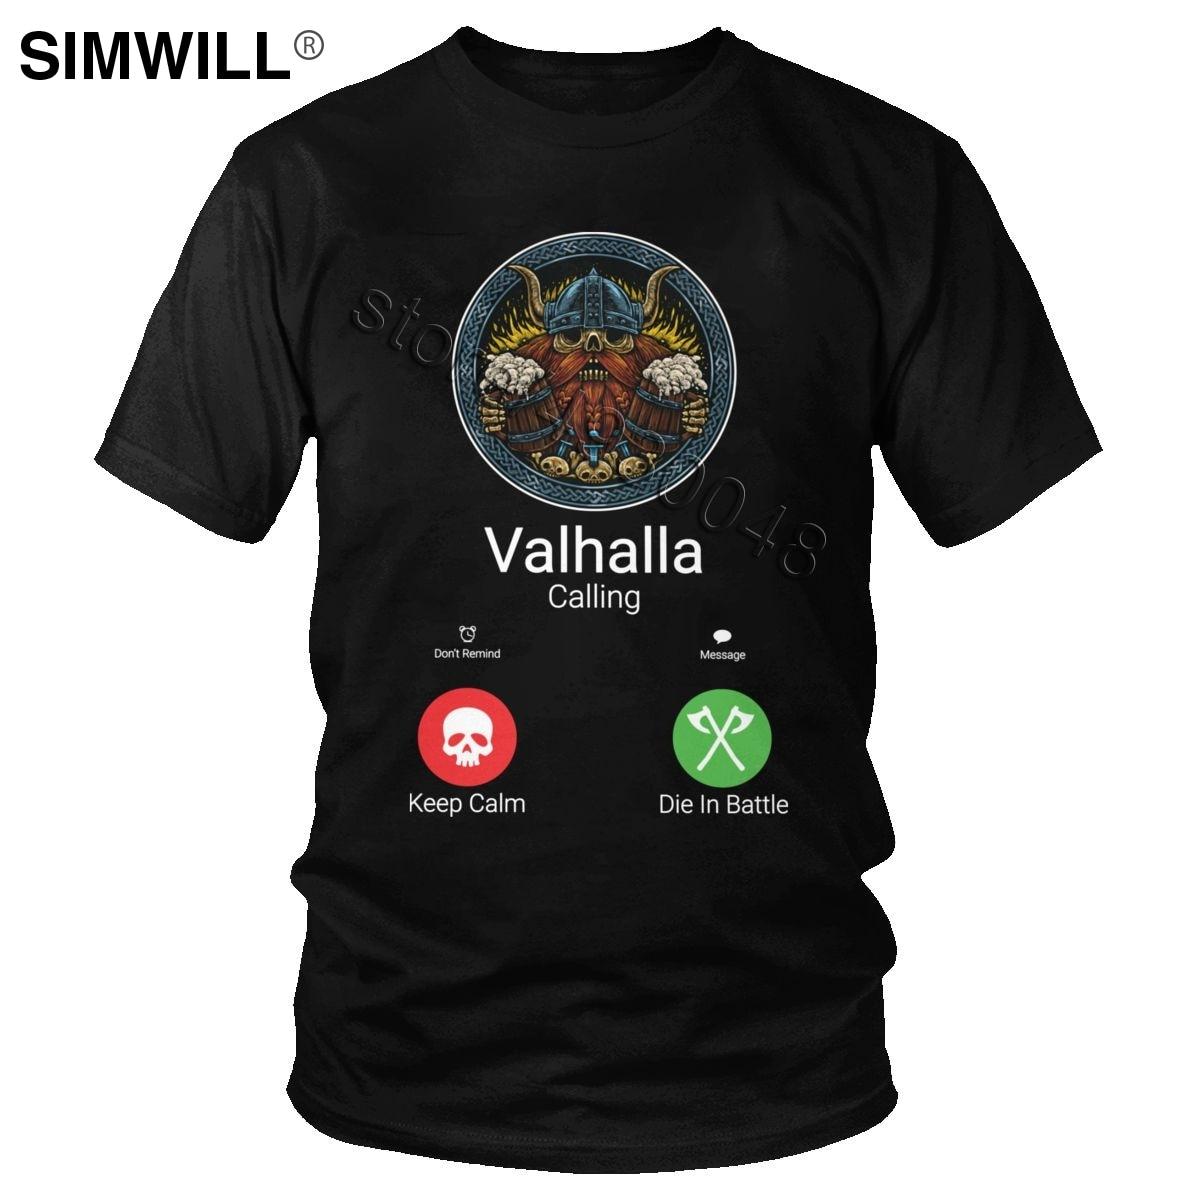 Novelty Men's Cotton Funny Valhalla Is Calling Shirt Short Sleeve Viking Odin Graphic T Shirt Streetwear Summer T-shirt Gift Tee